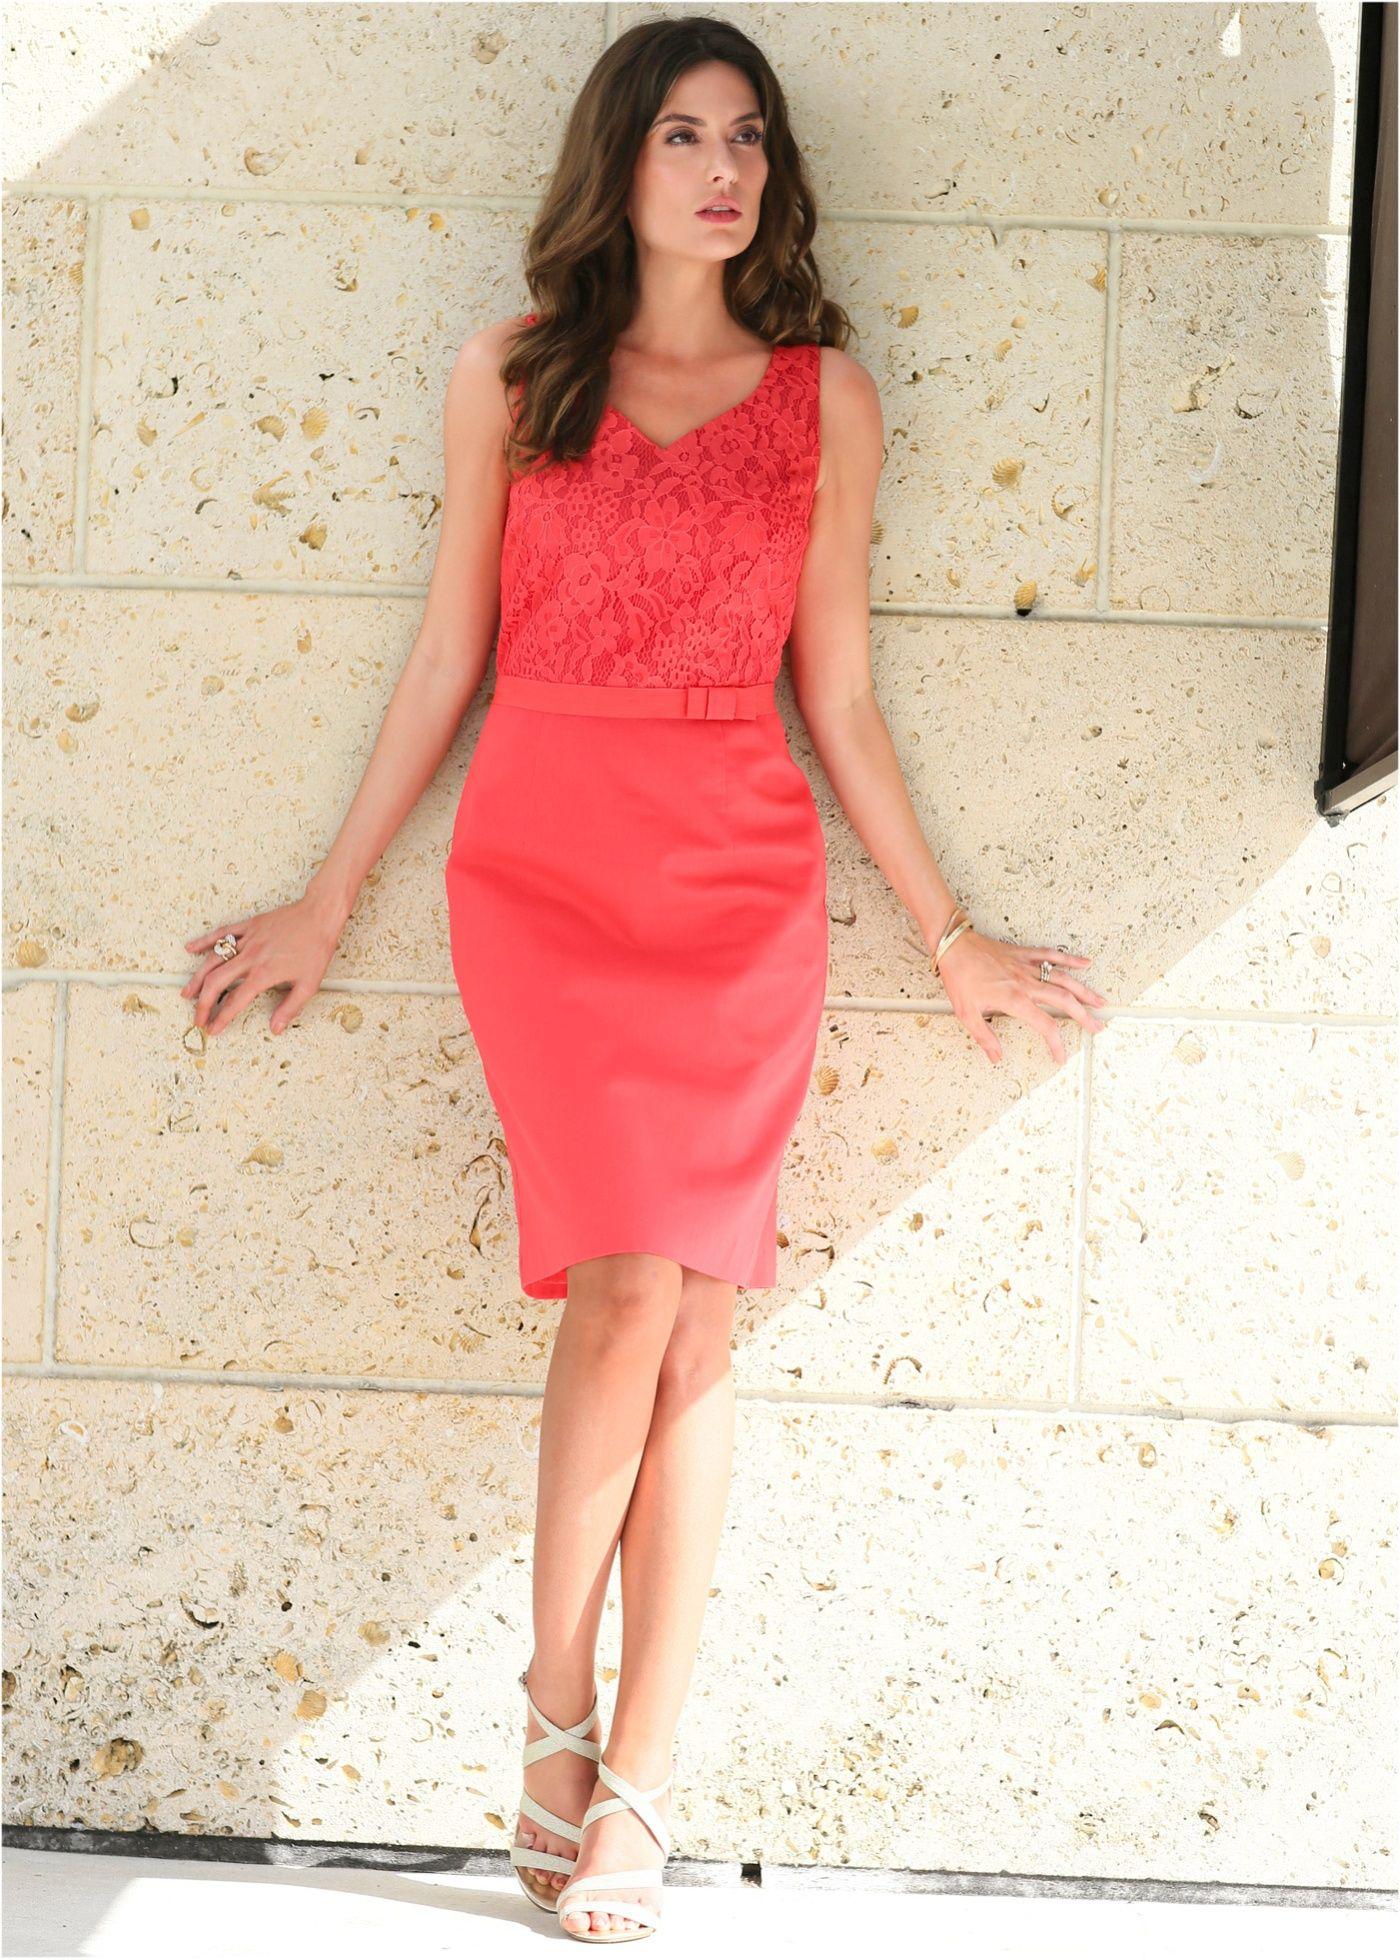 Bonprix damen kleider elegant popul rer kleiderstandort fotoblog - Bonprix kinderkleider ...